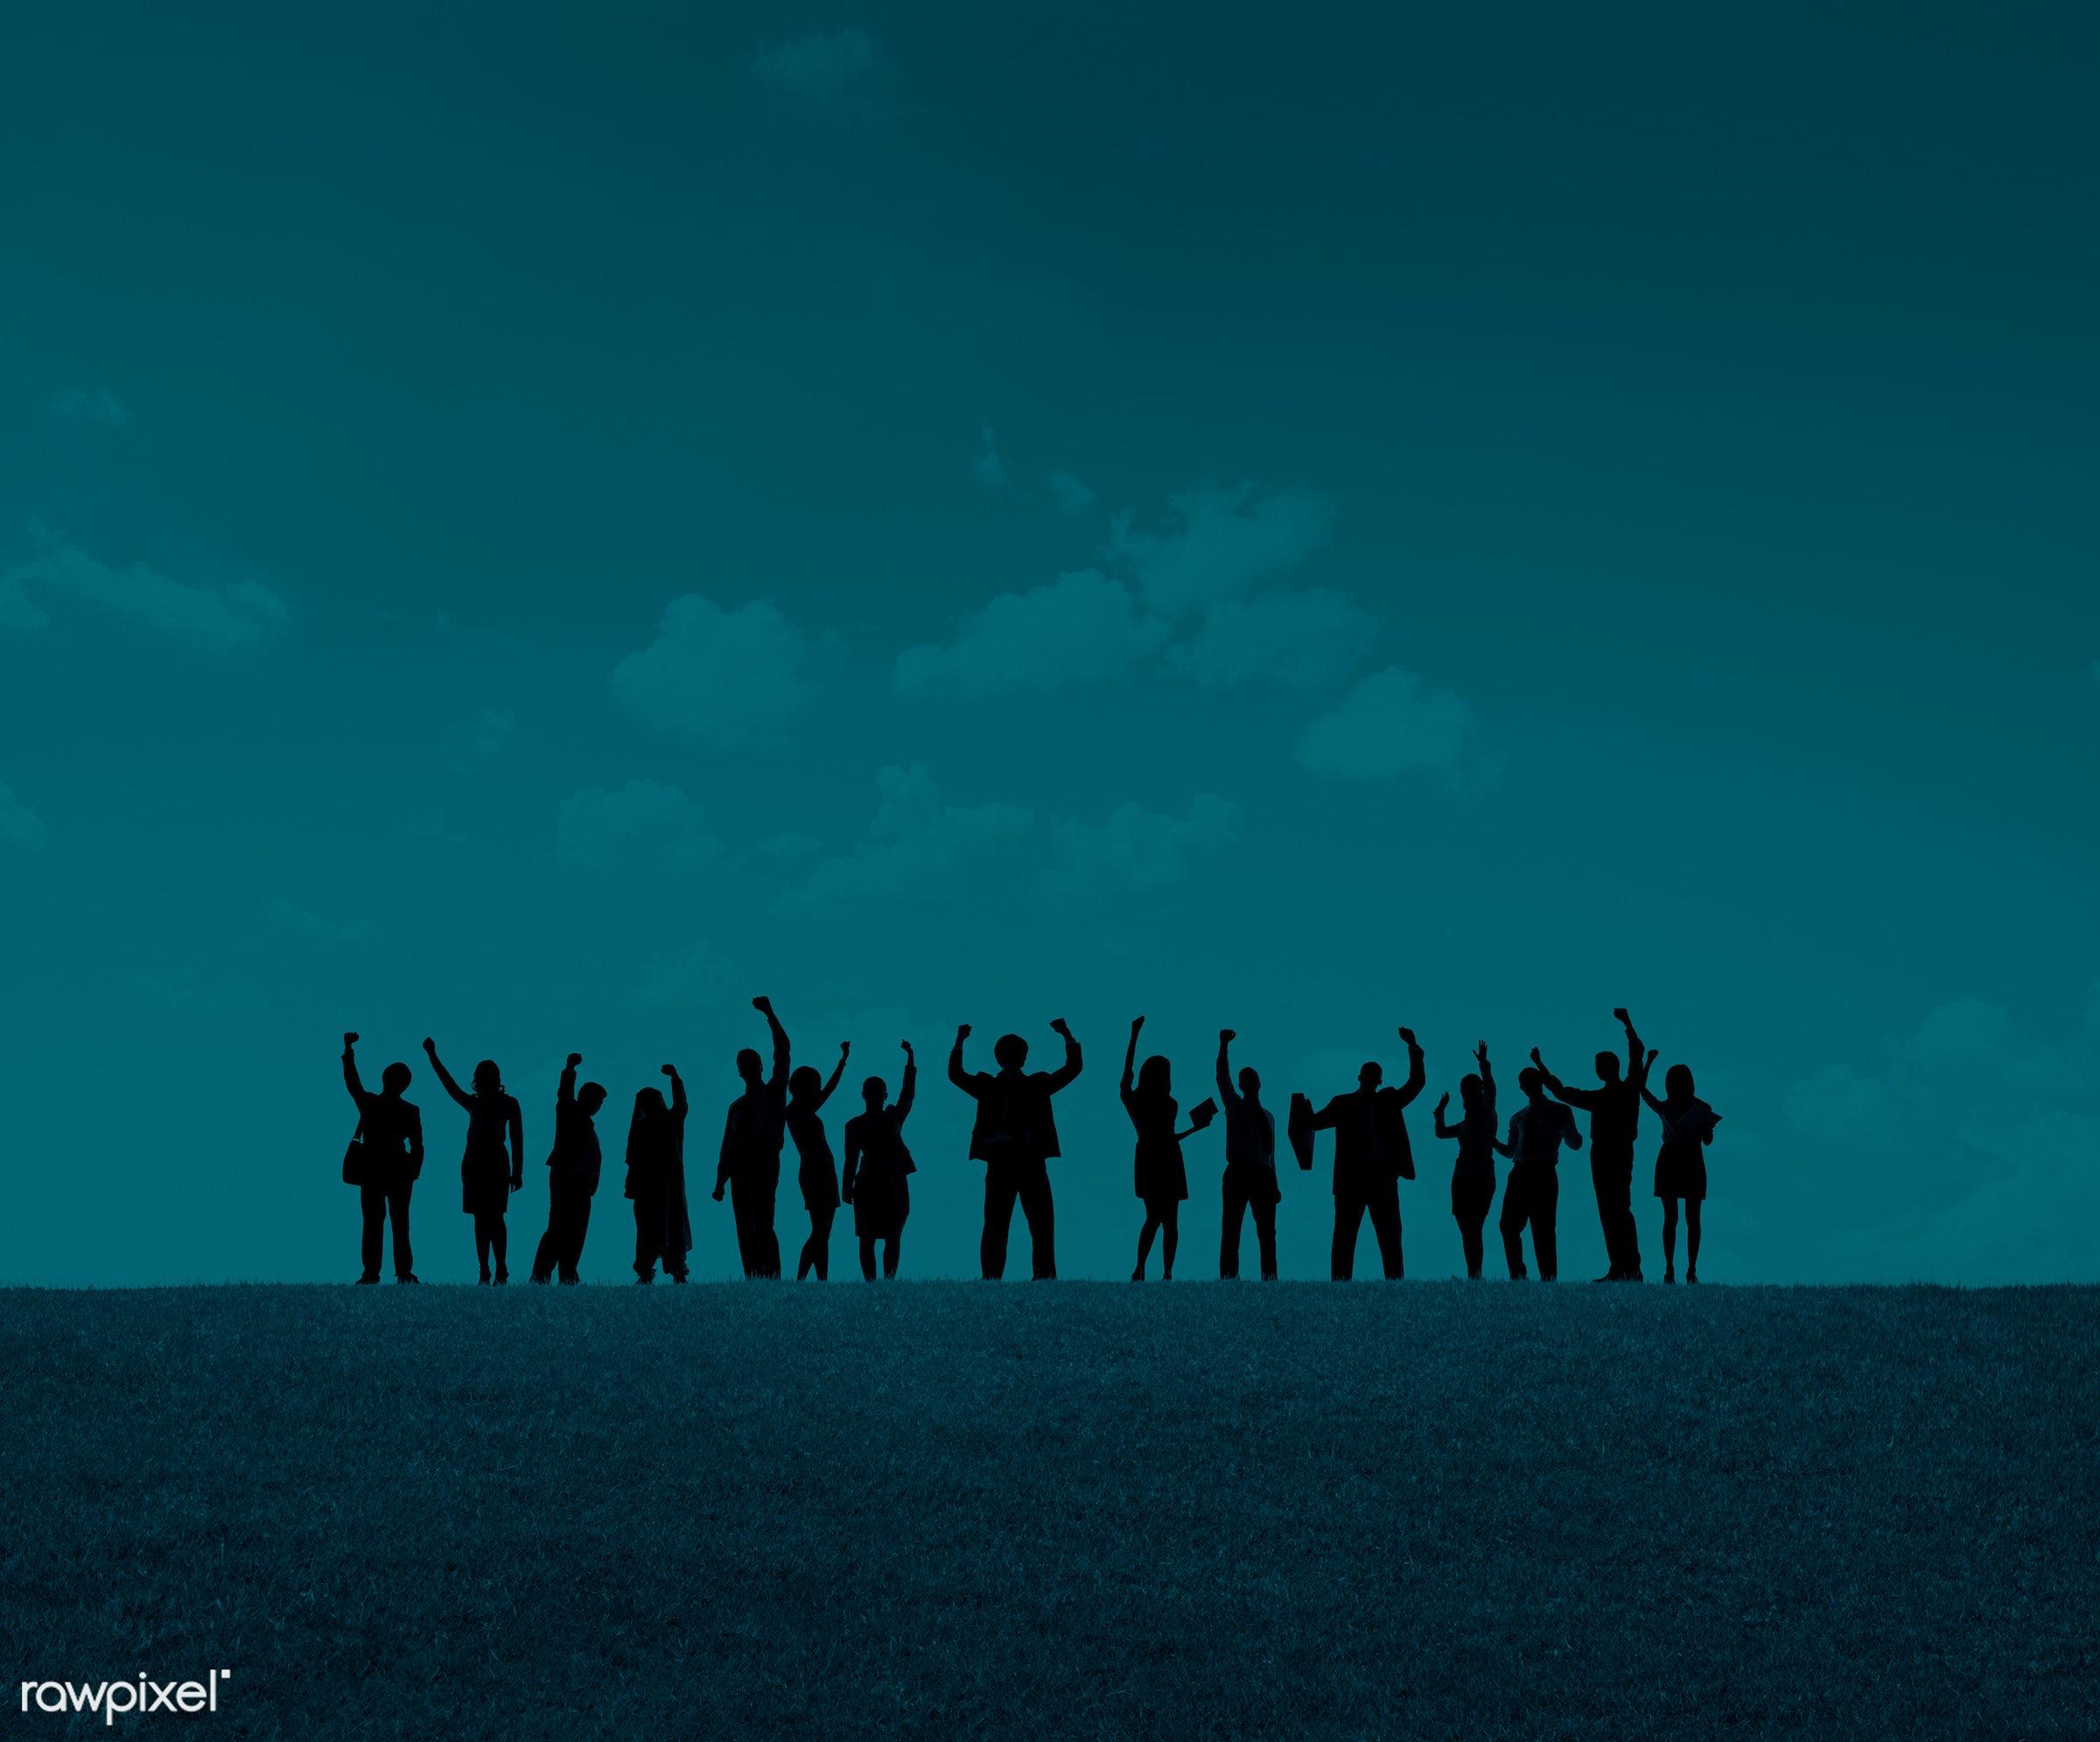 achievement, arms raised, aspiration, blank, blue, business, business people, businessmen, businesswomen, celebrating,...